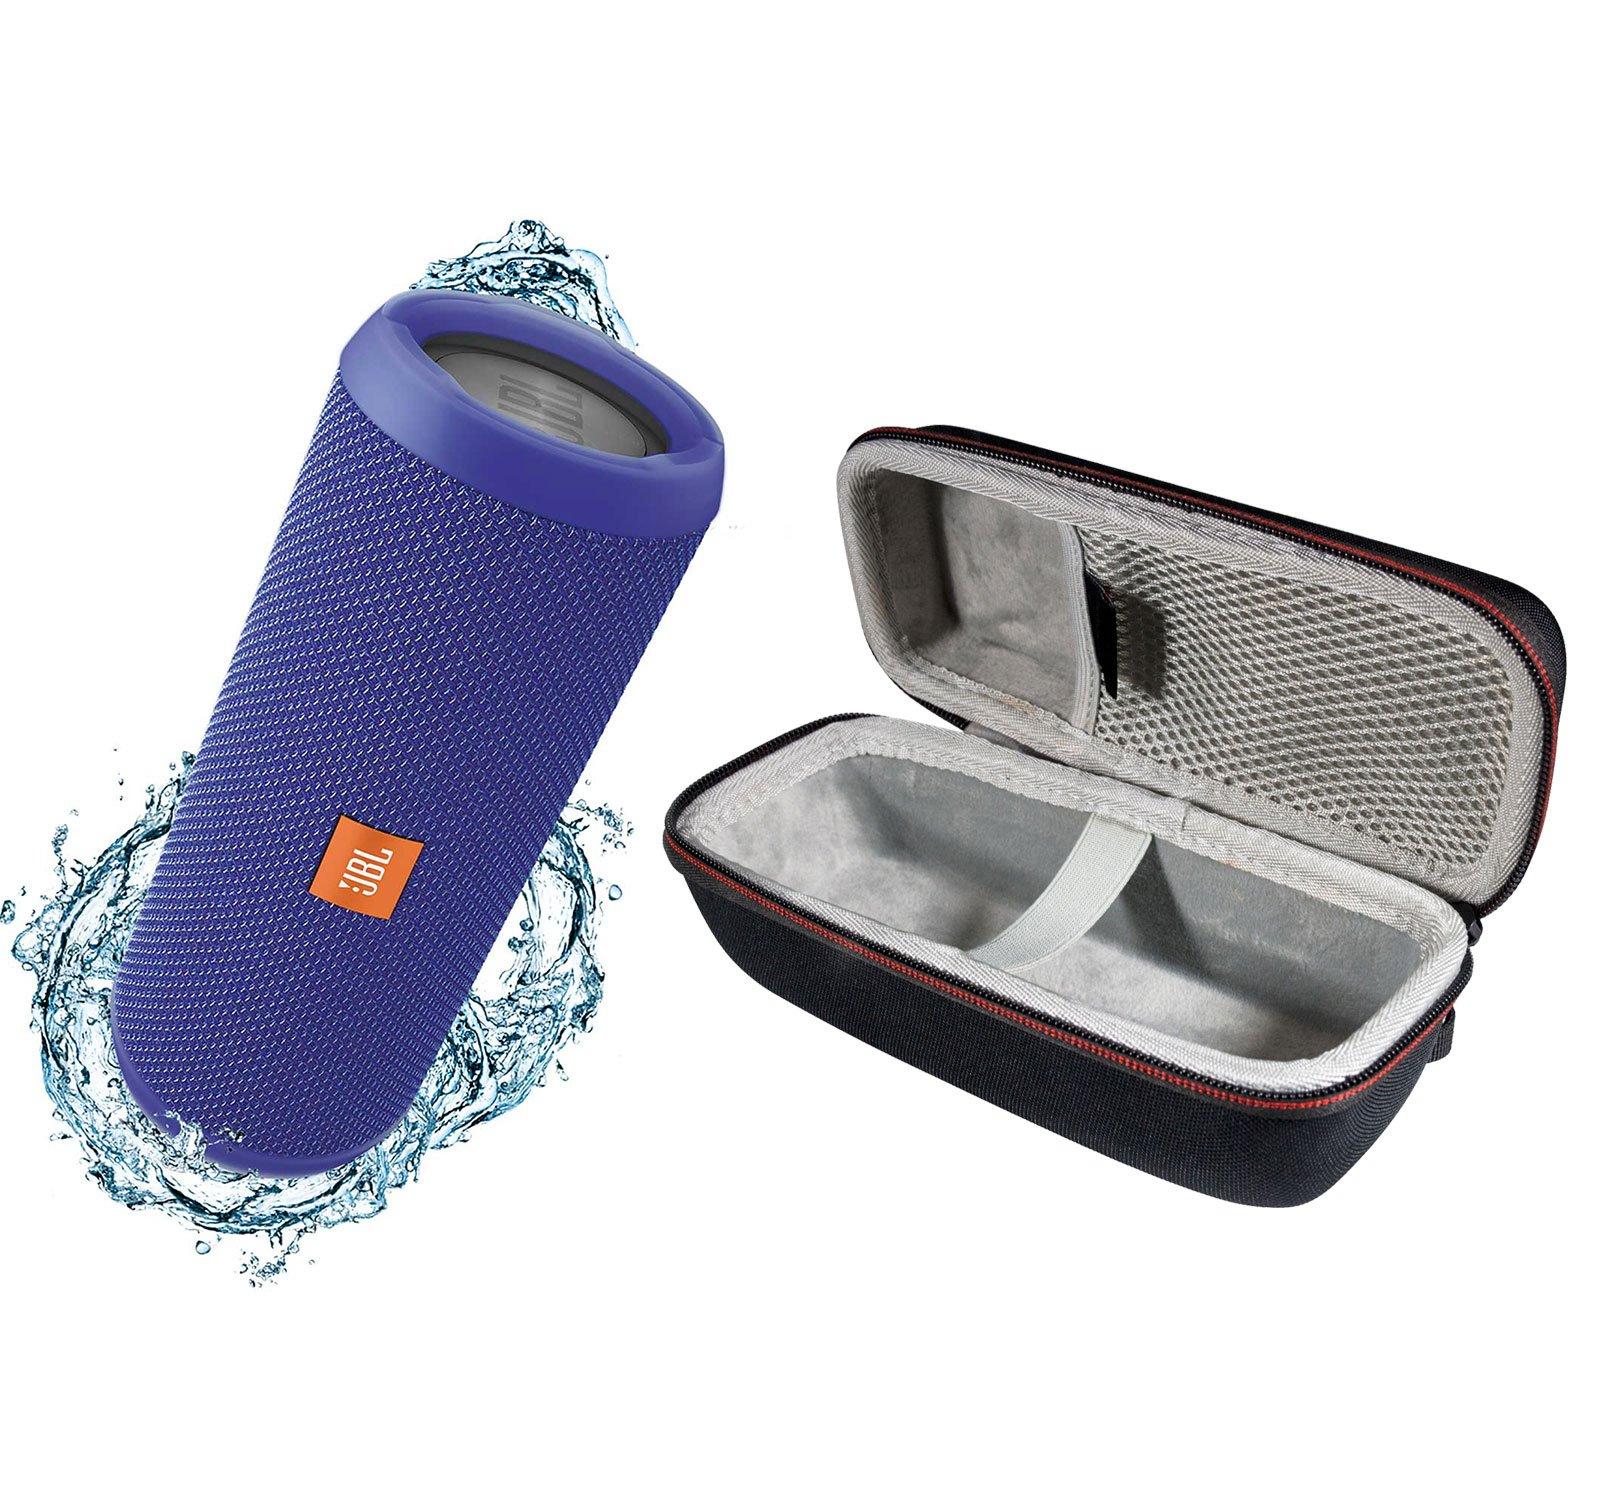 JBL Flip 3 Portable Splashproof Bluetooth Wireless Speaker Bundle with Hardshell Case - Blue